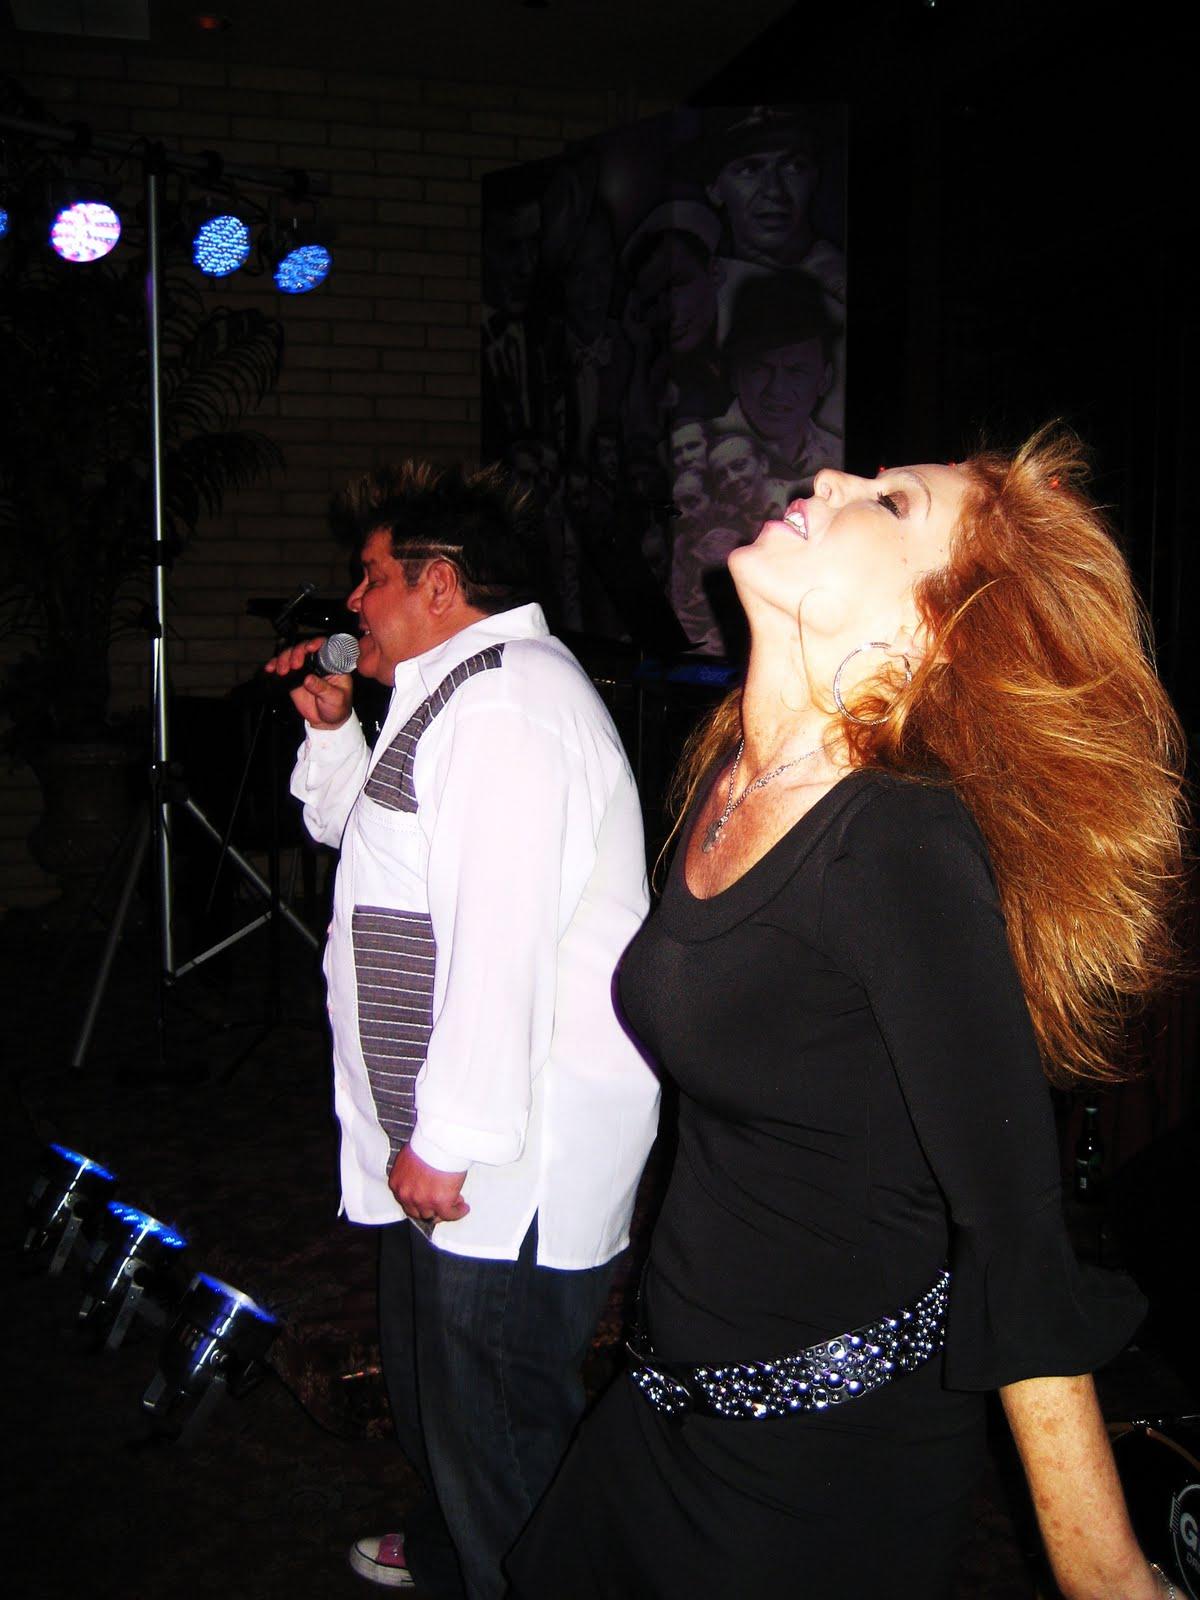 http://4.bp.blogspot.com/_8nYbd_HLh2s/S-NMWxf3qgI/AAAAAAAABcM/SuVdwruKYBg/s1600/5-3-20+open+mic+063.JPG